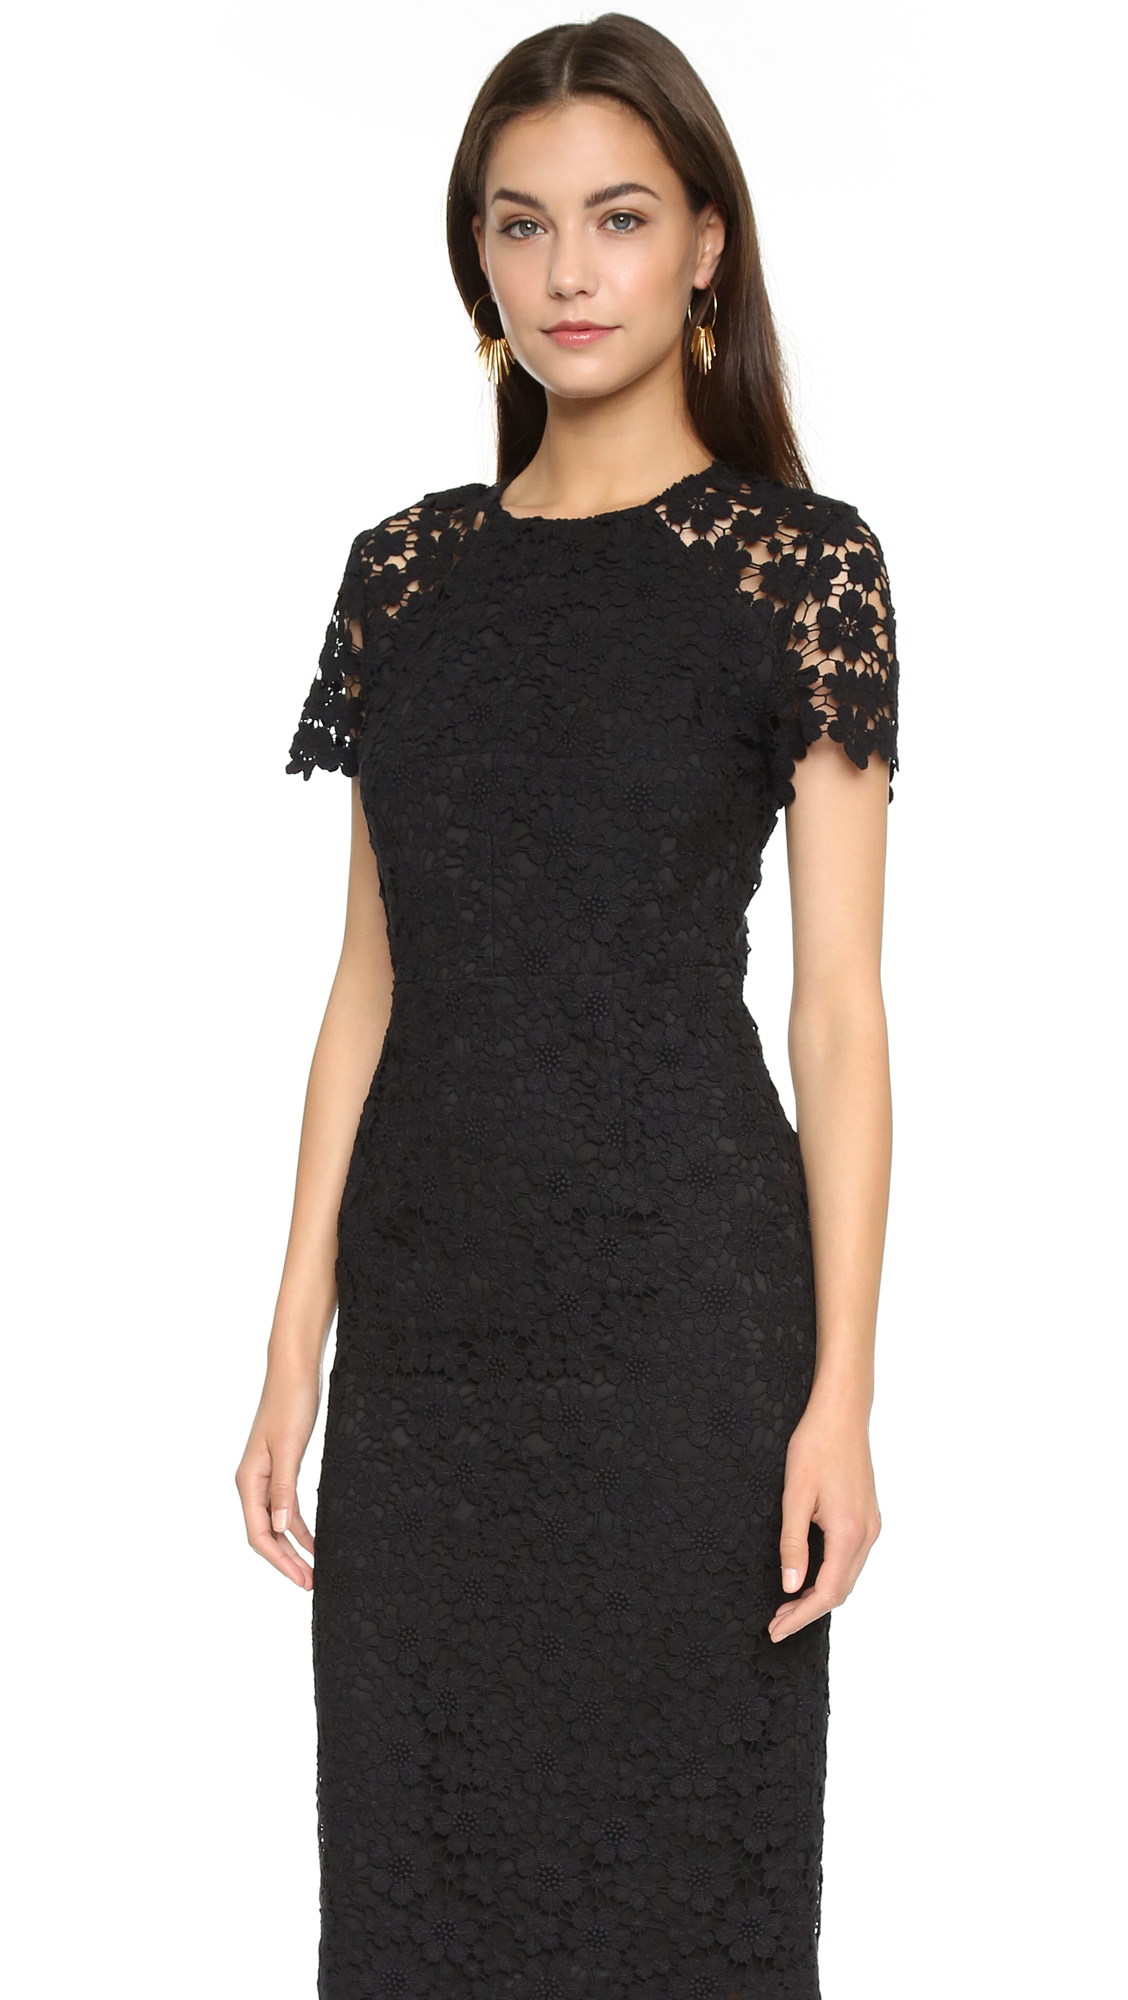 Shoshanna Short-sleeve Lace Midi Sheath Dress in Black | Lyst